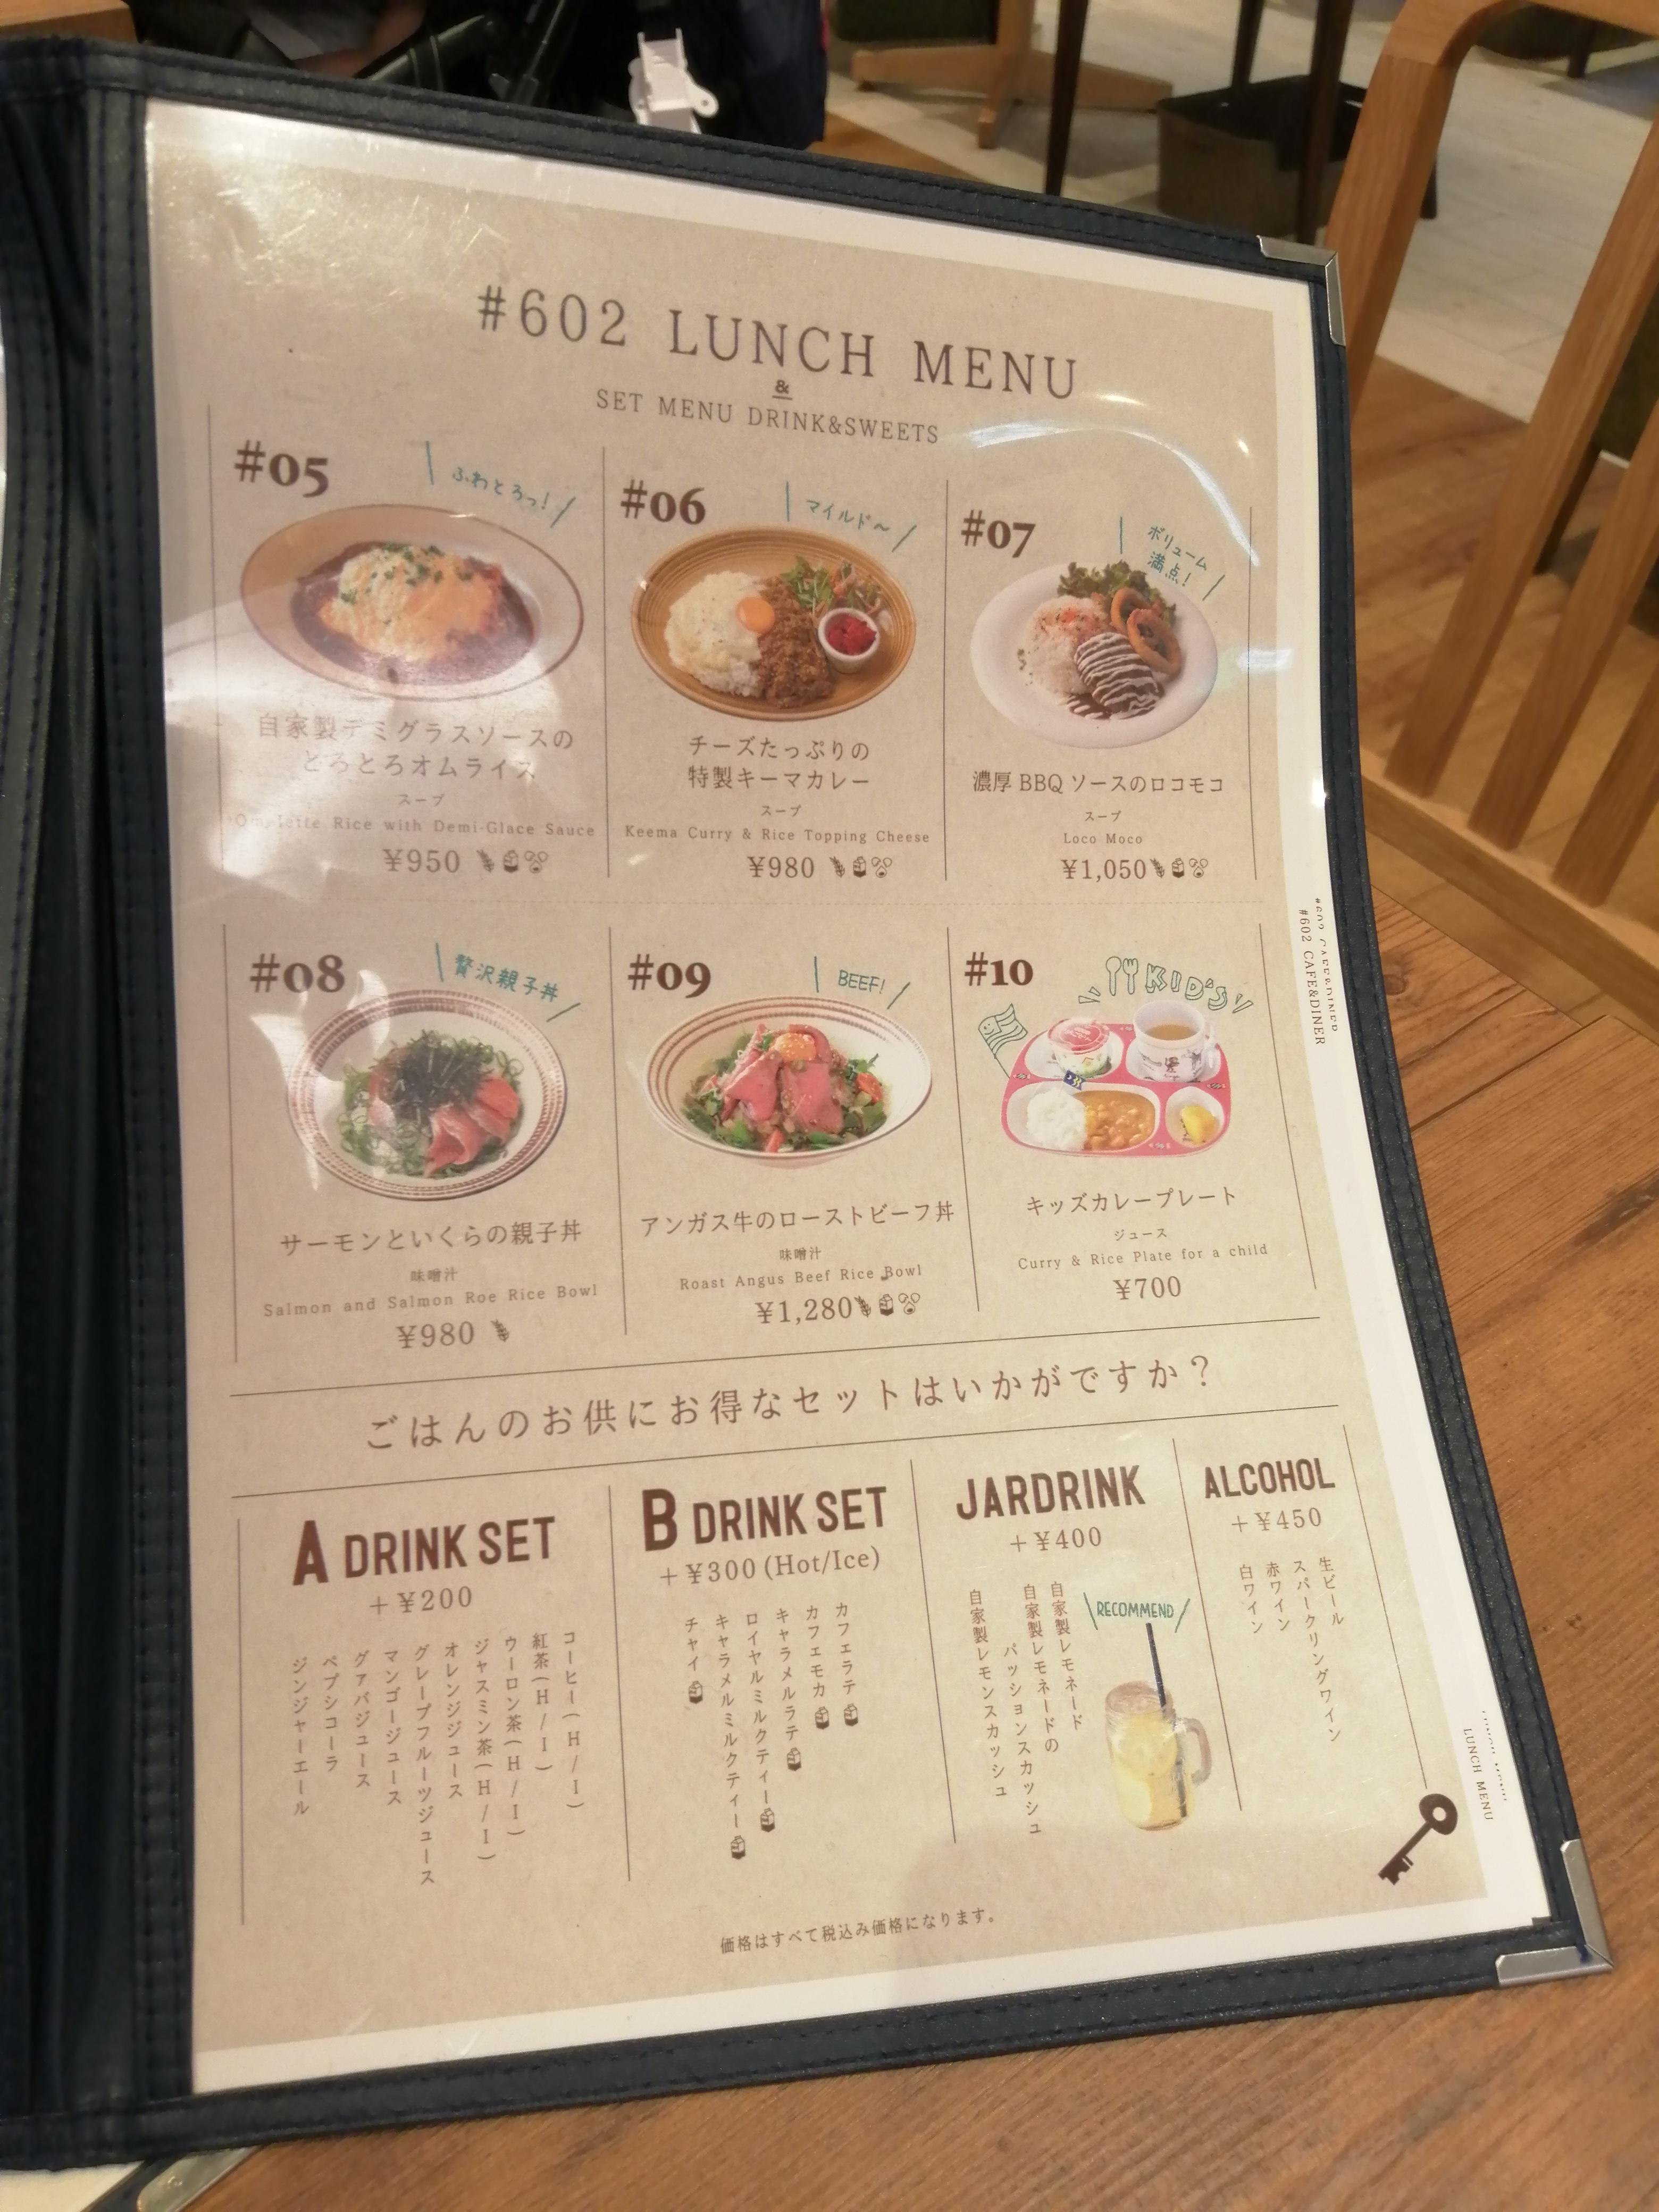 「#602 CAFE&DINER(ロクマルニ カフェ&ダイナー)」のランチメニュー